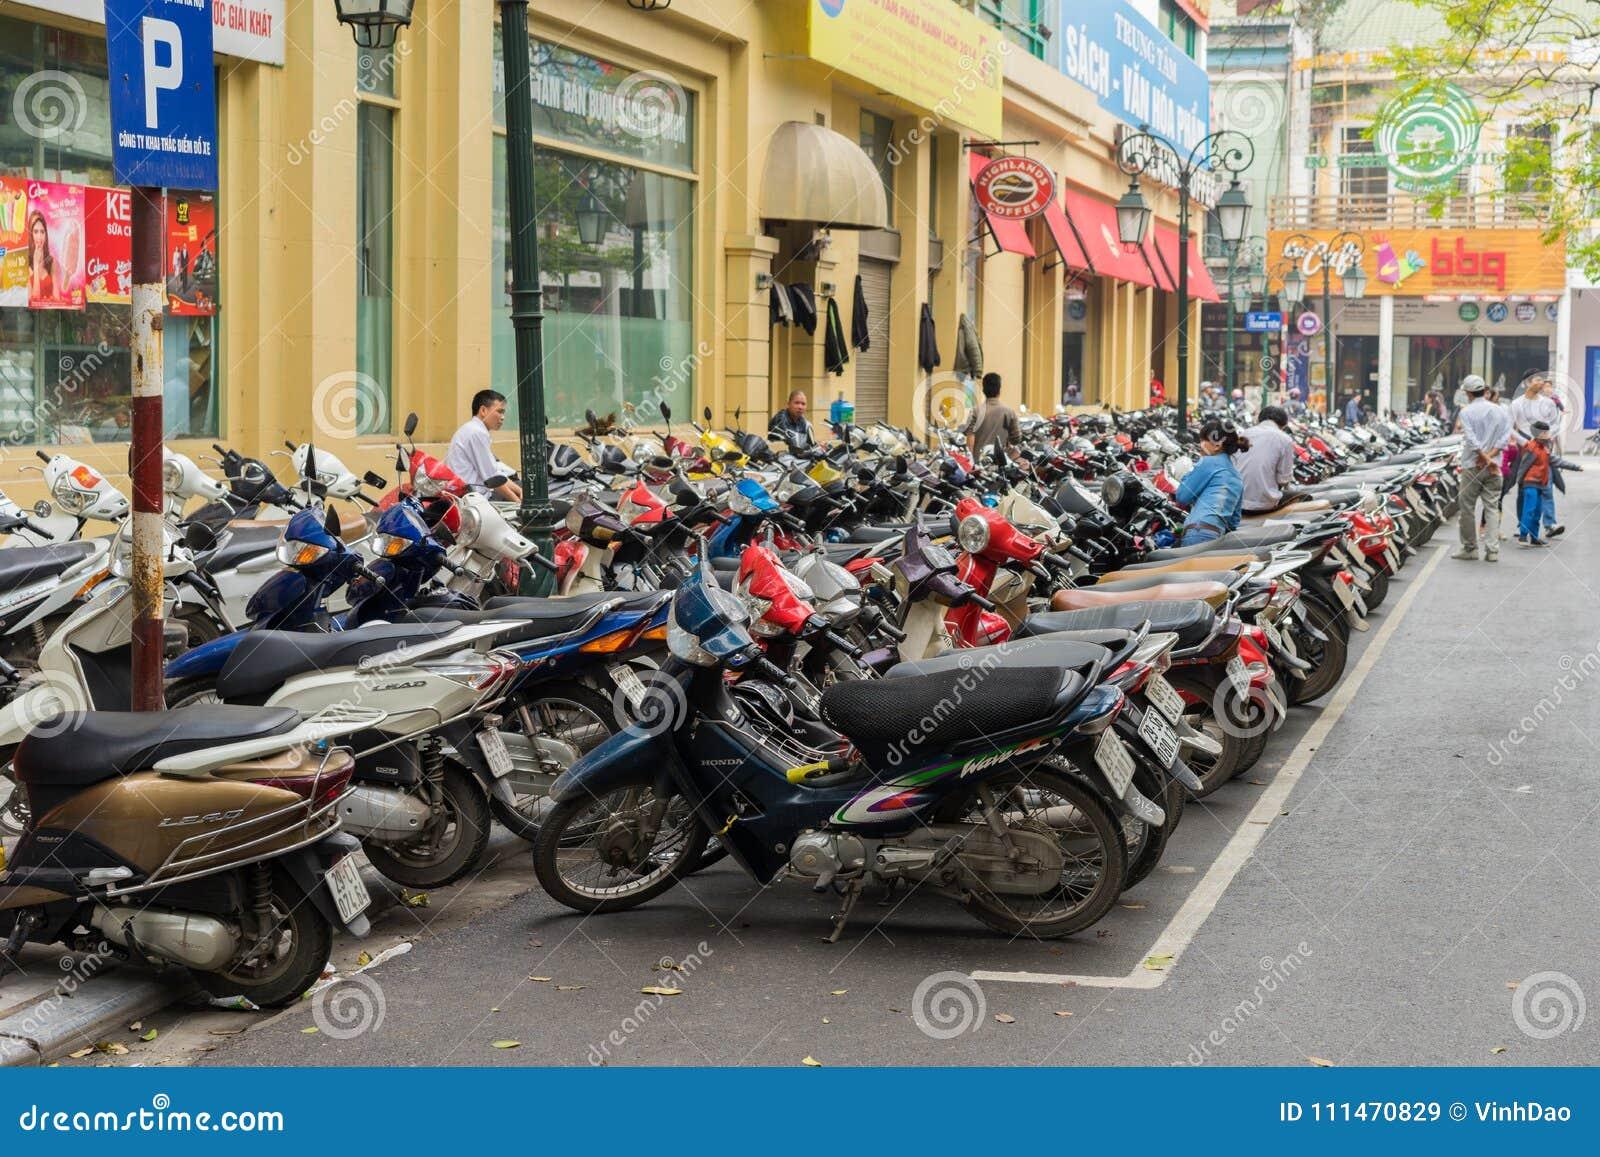 Hanoi, Vietnam - Mar 15, 2015: The parking of motorbikes on street in Trang Tien street. Hanoi lacks of parking area for motorbike